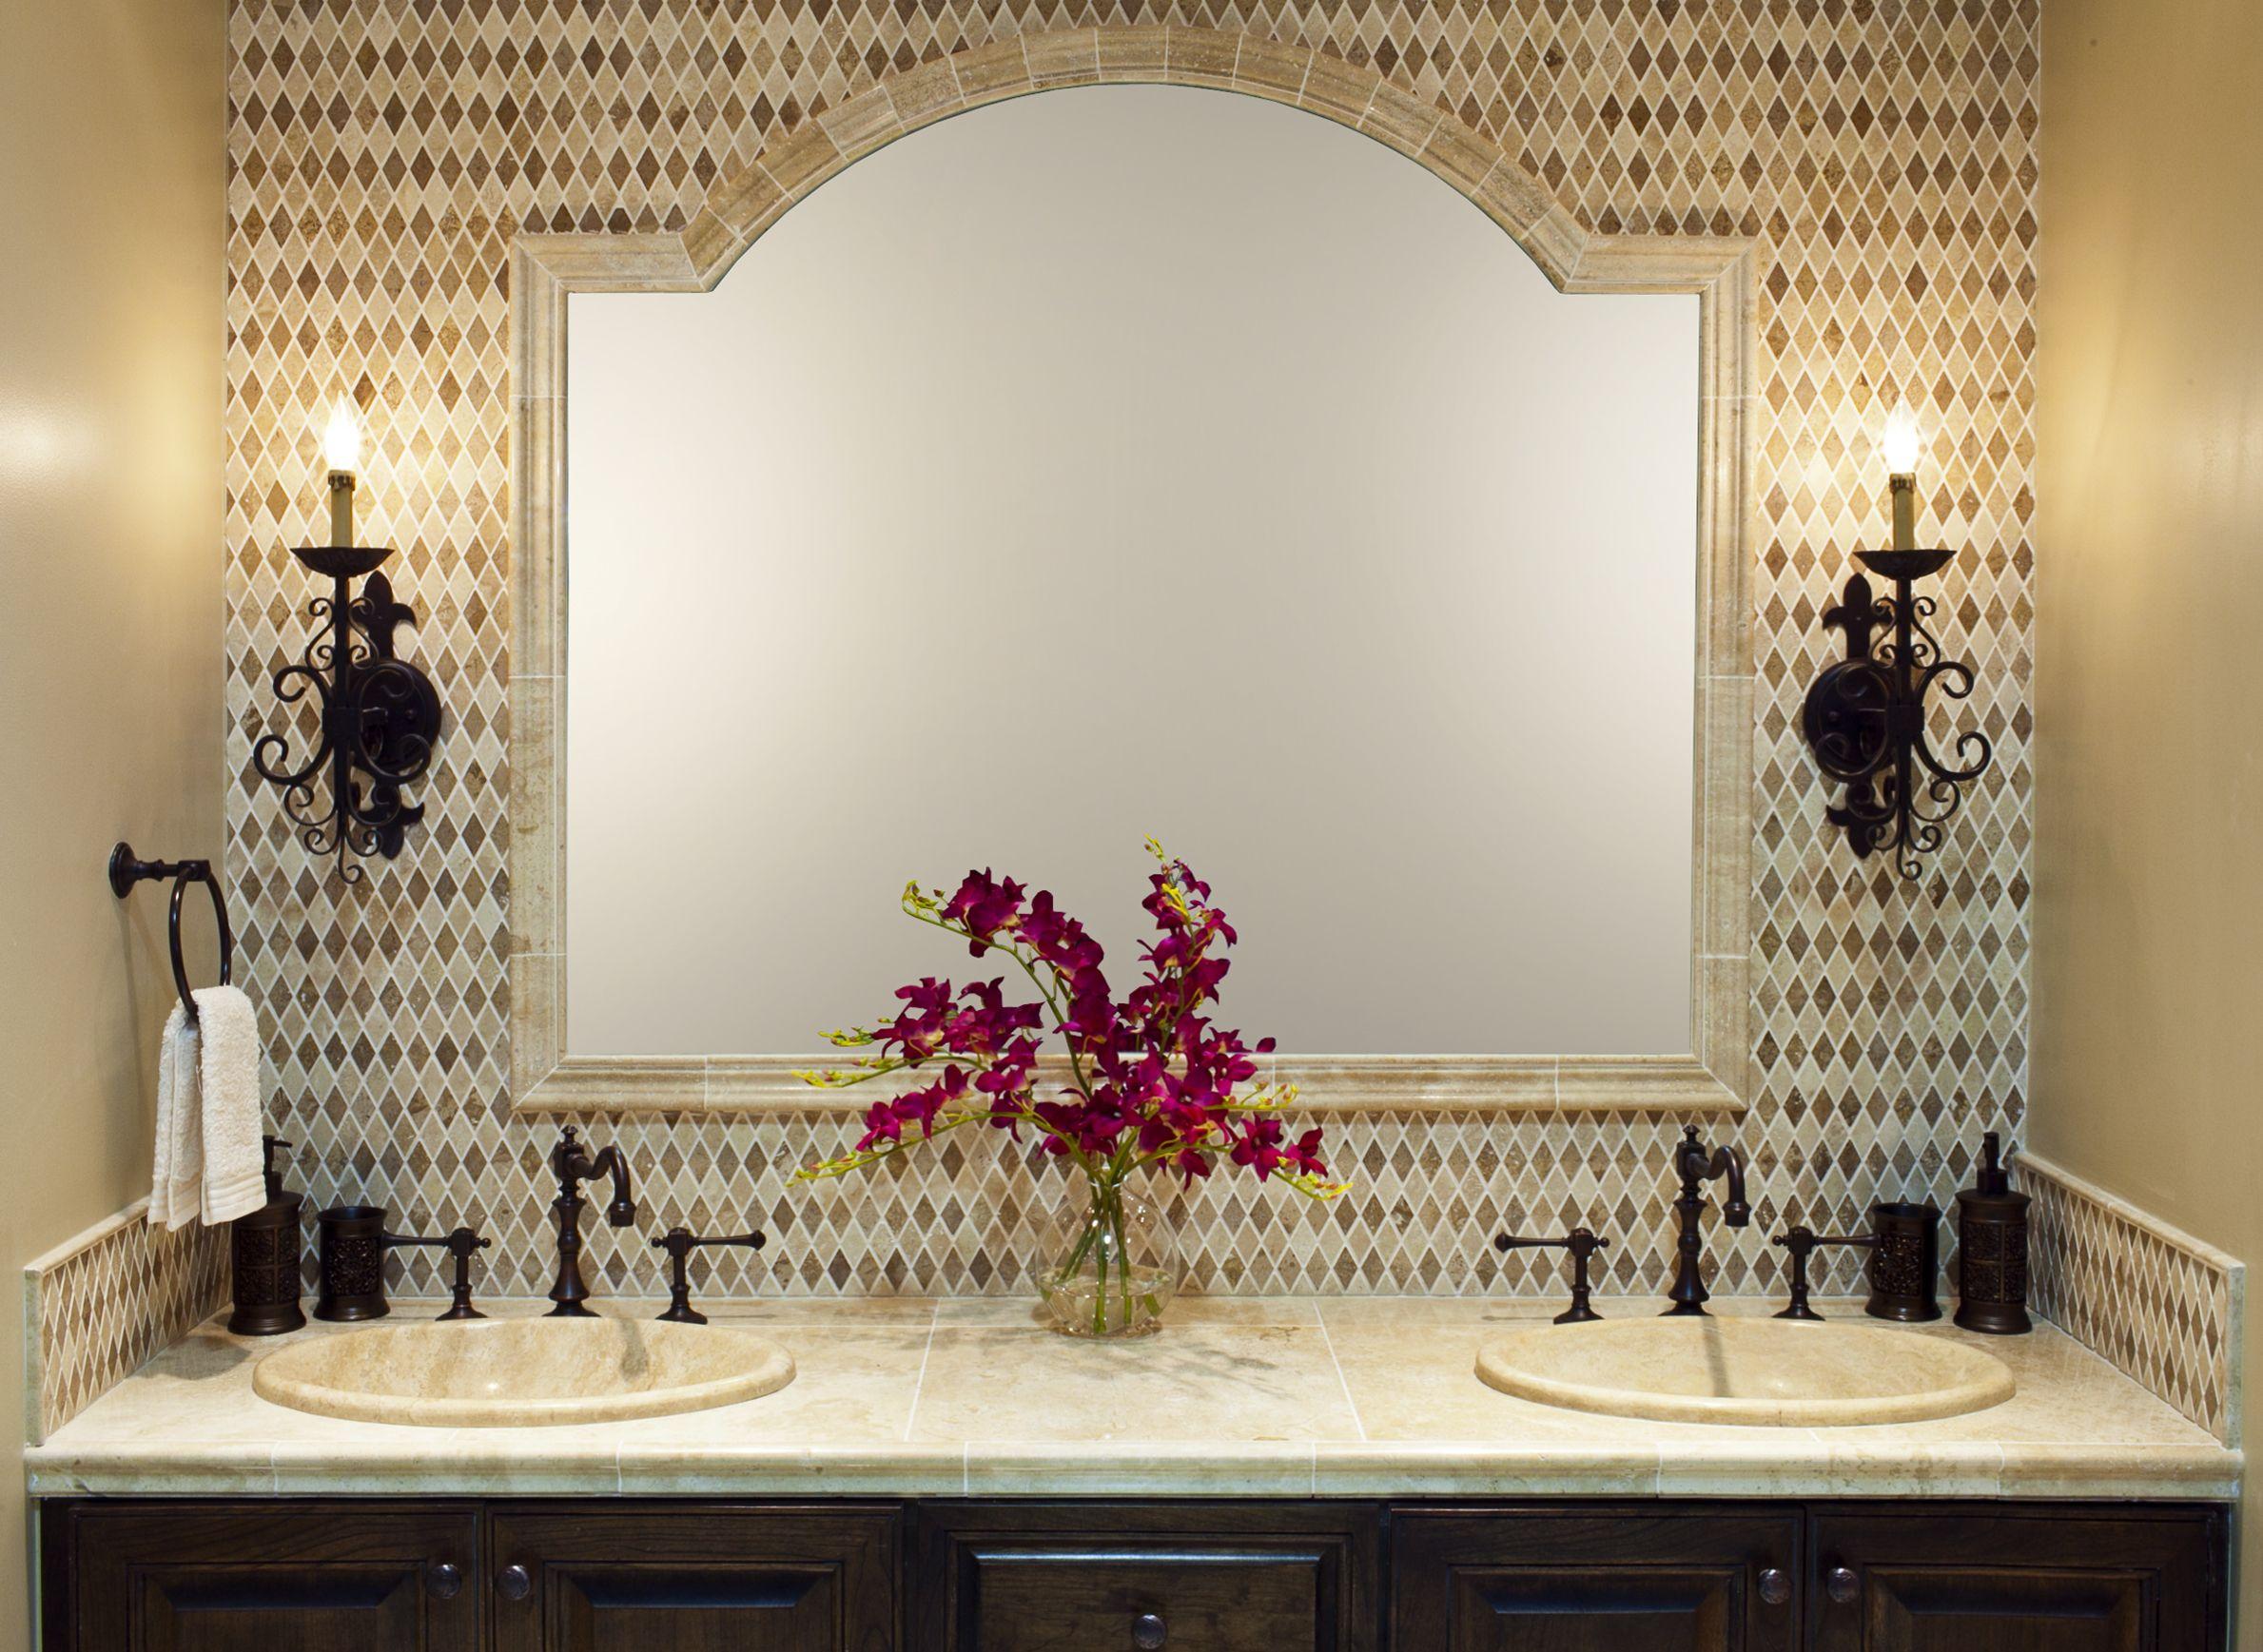 Shine bright like a diamond. #thetileshop | bathroom | Pinterest ...